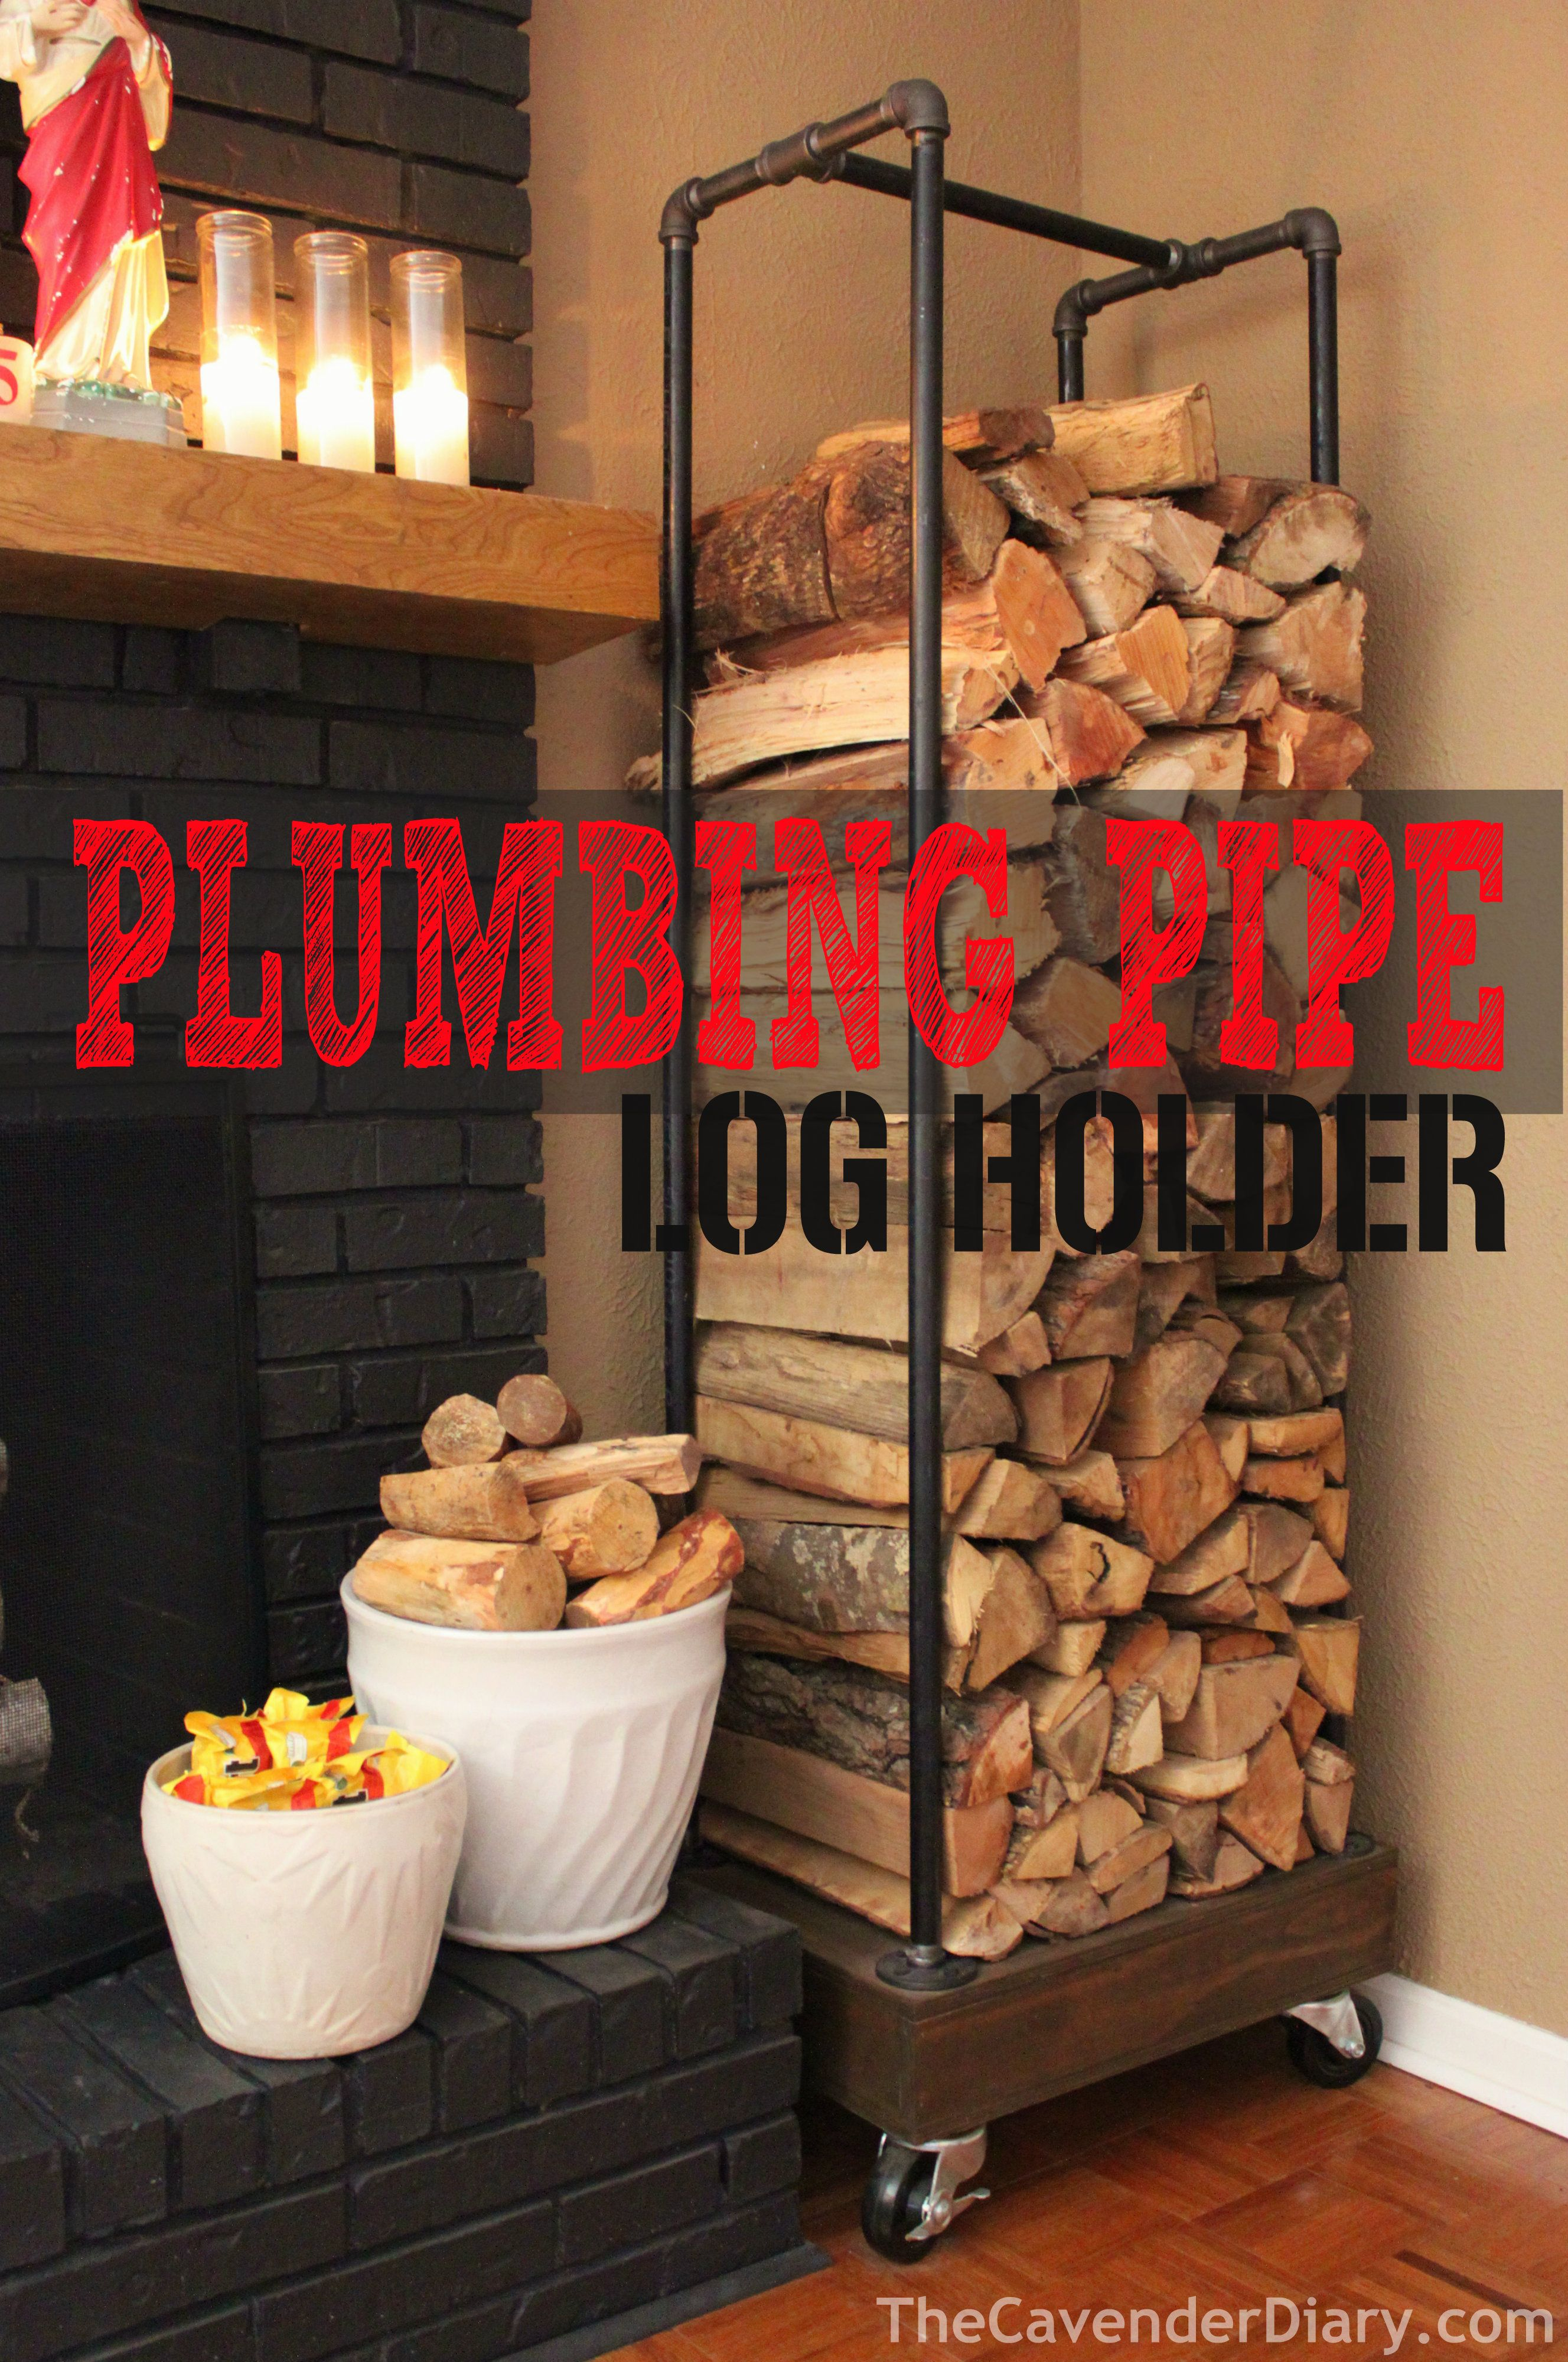 Great Tutorial DIYrollinglogholdermadefromplumbingpipes - Creative firewood storage ideas turning wood beautiful yard decorations